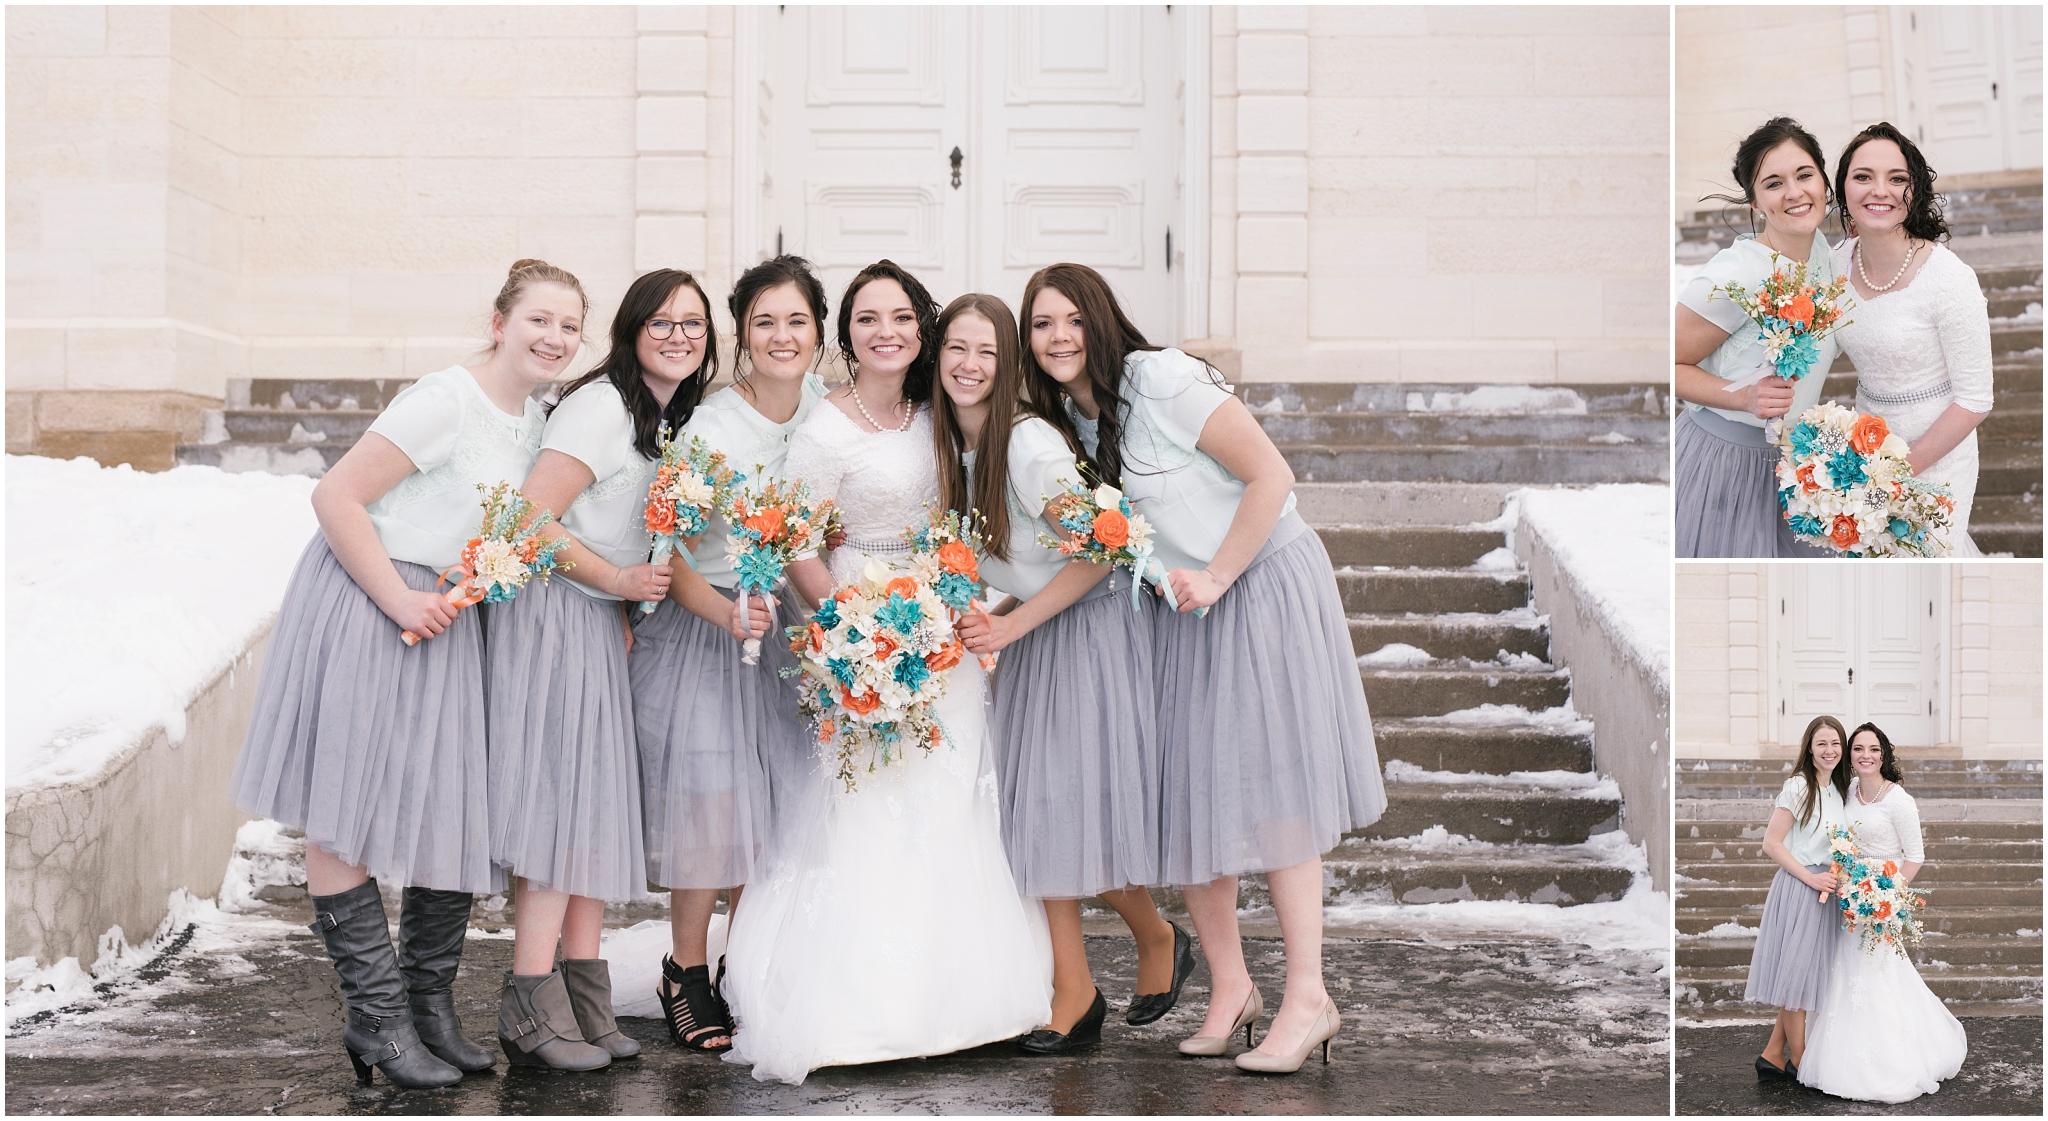 Bo Alyssa Wedding-87_Lizzie-B-Imagery-Utah-Wedding-Photographer-Central-Utah-Photographer-Utah-County-Manti-Temple.jpg